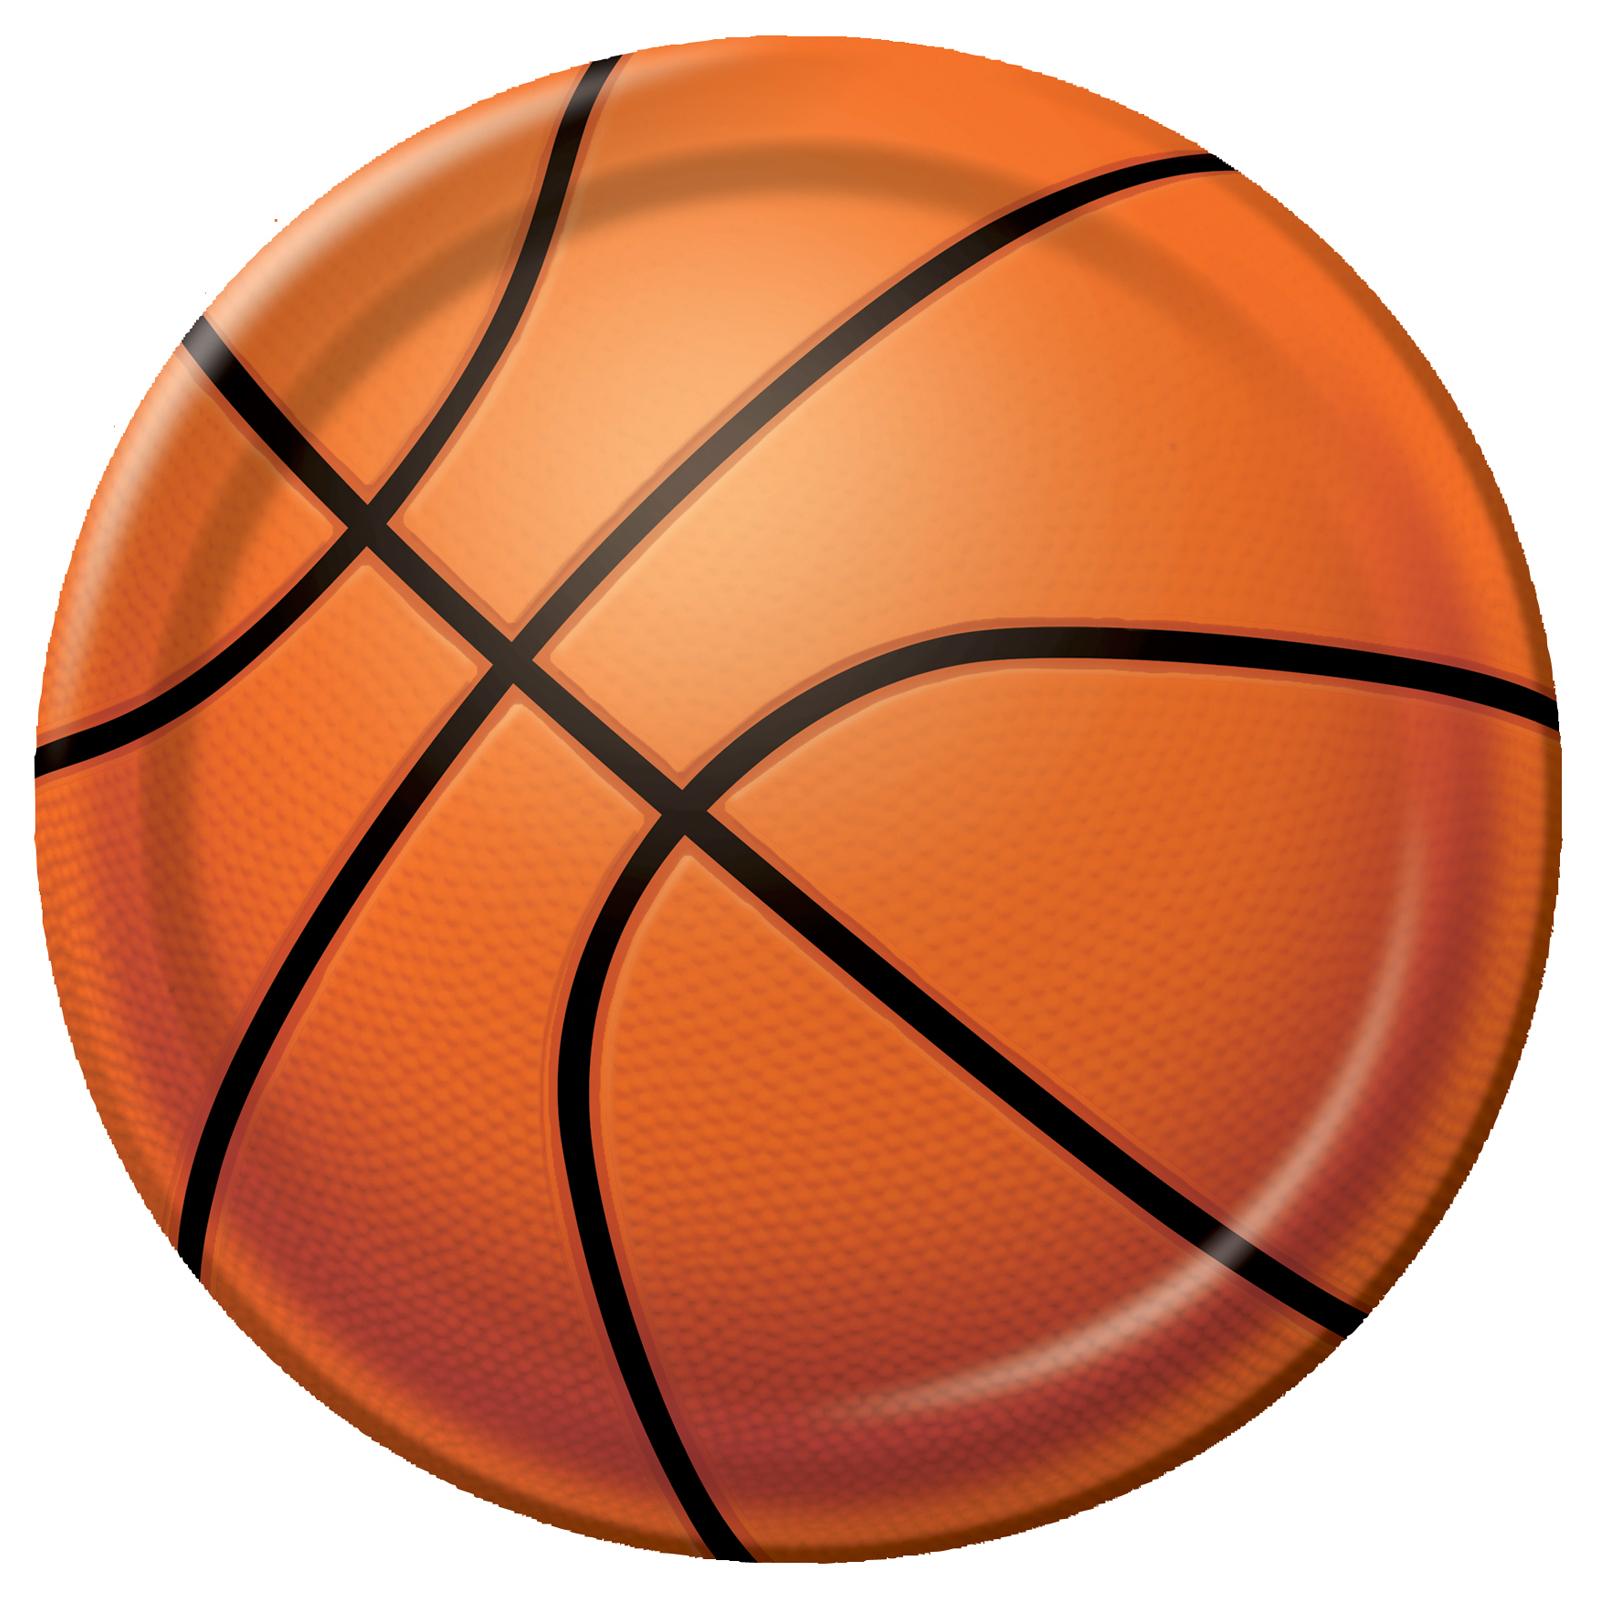 Баскетбольный мяч, обои на рабочий стол, фото